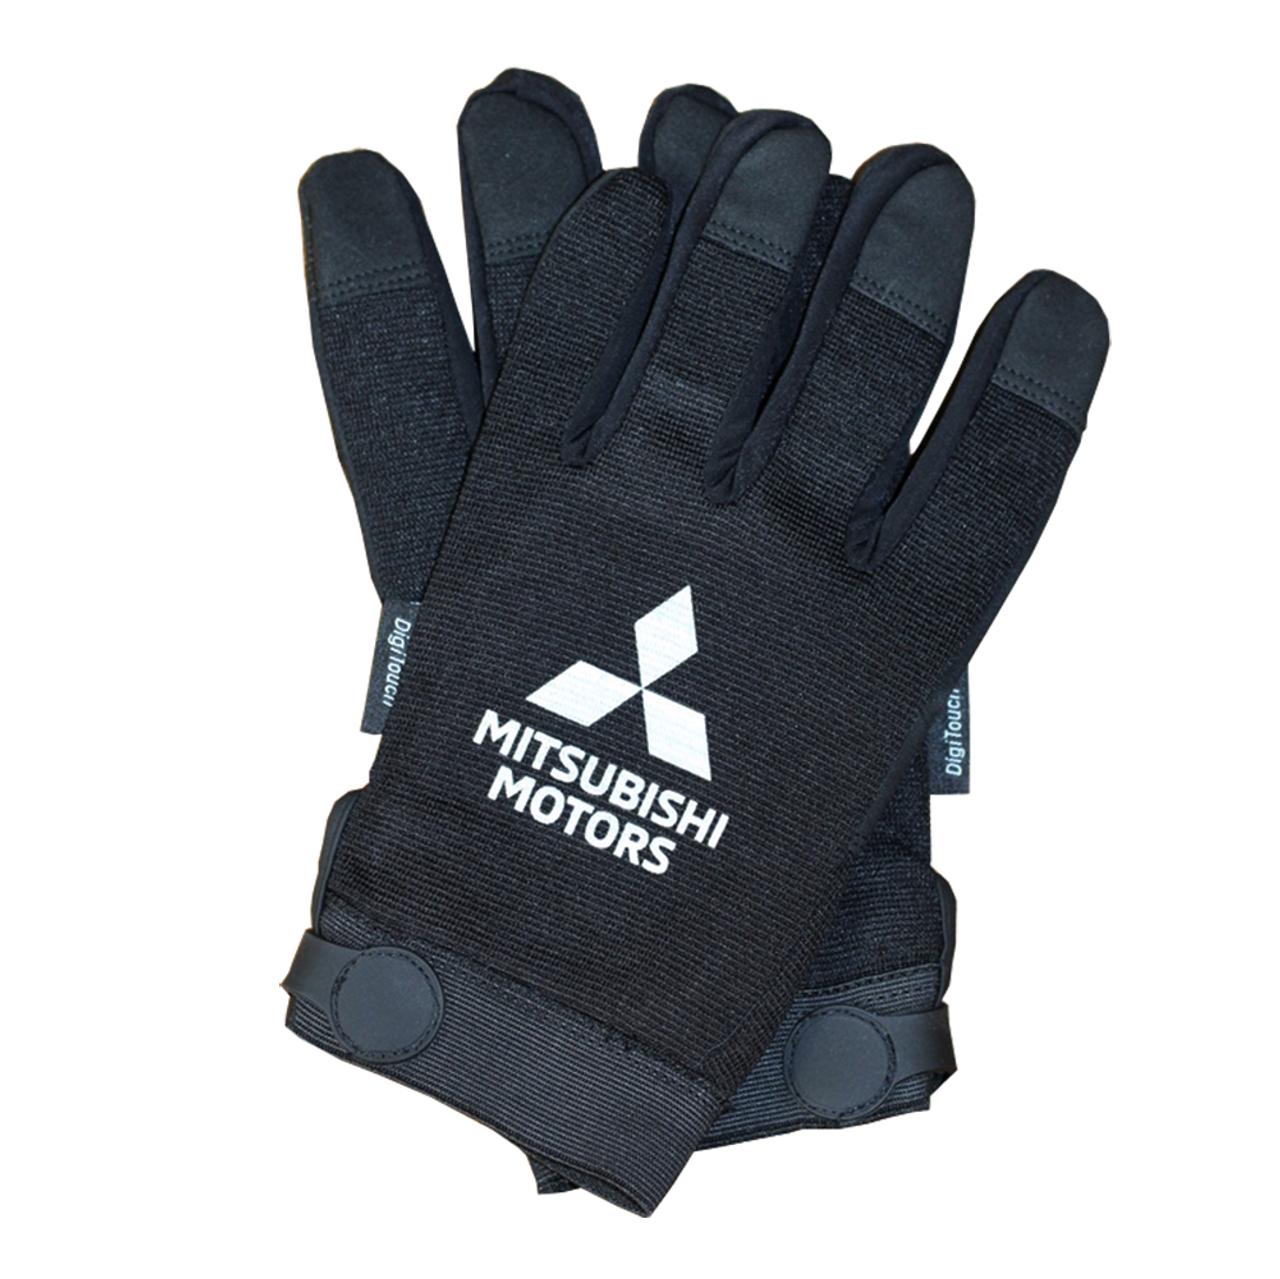 Technician Gloves